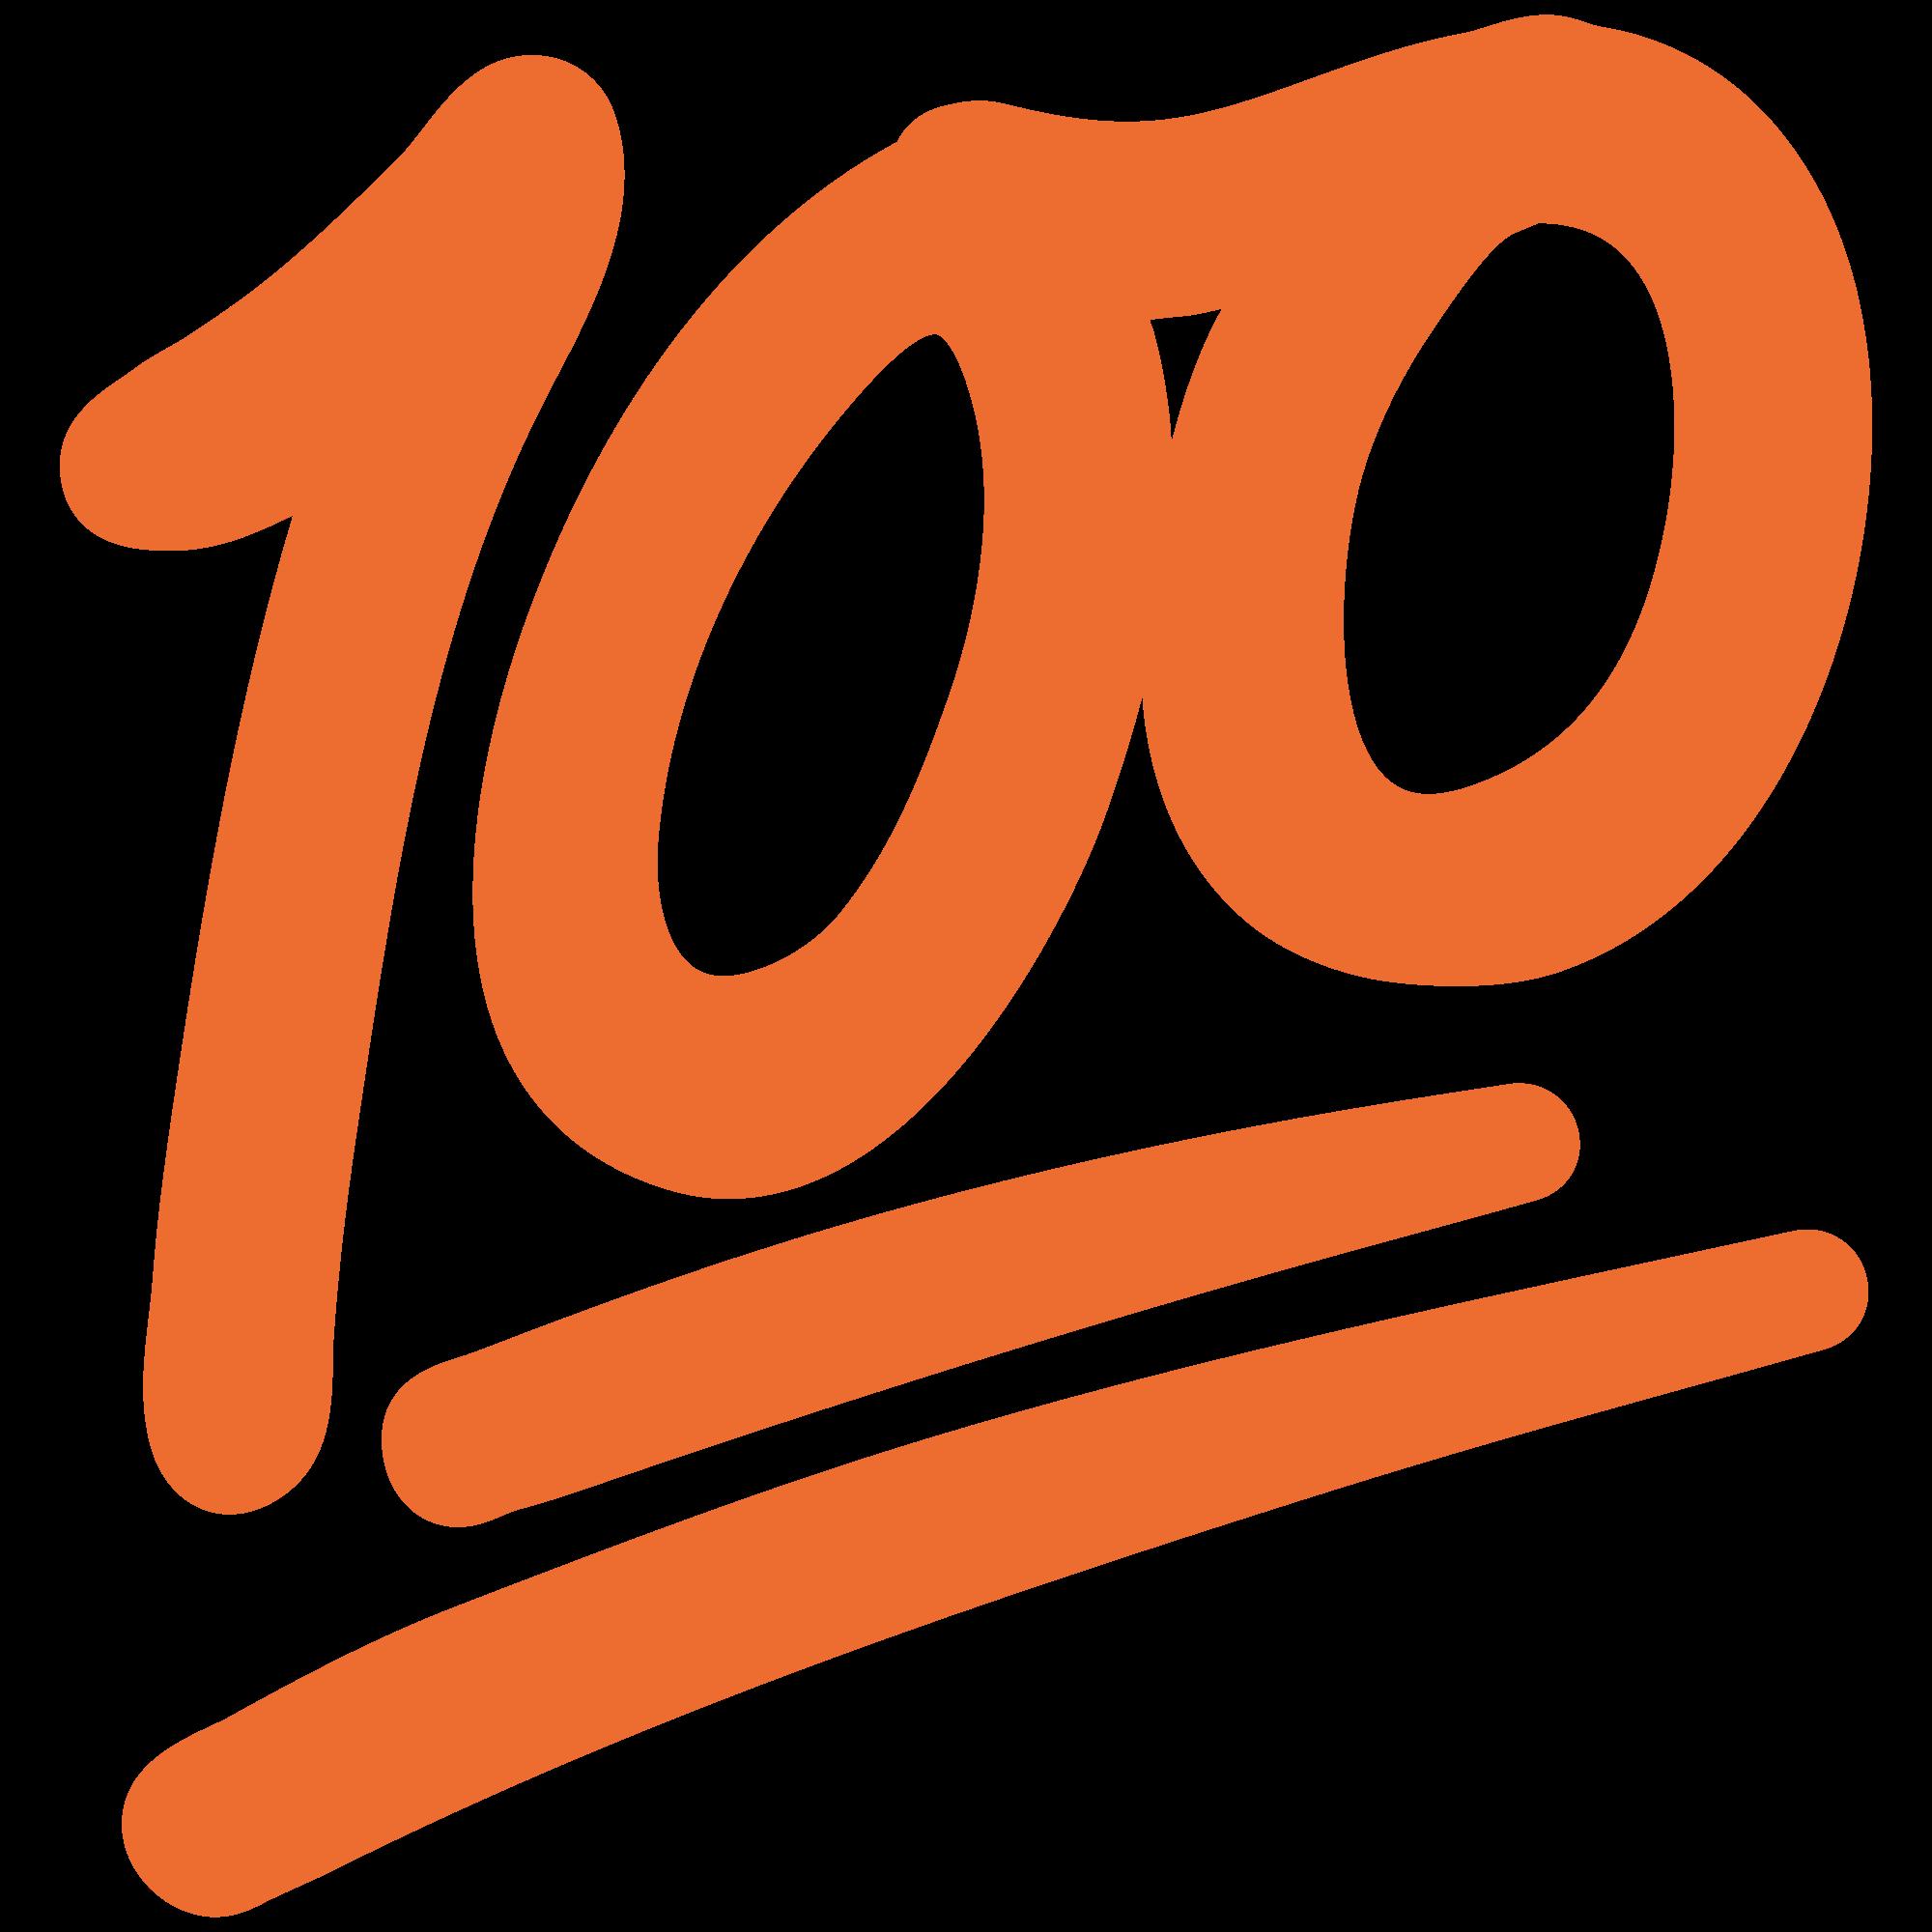 100 clipart transparent emoji. File u f af